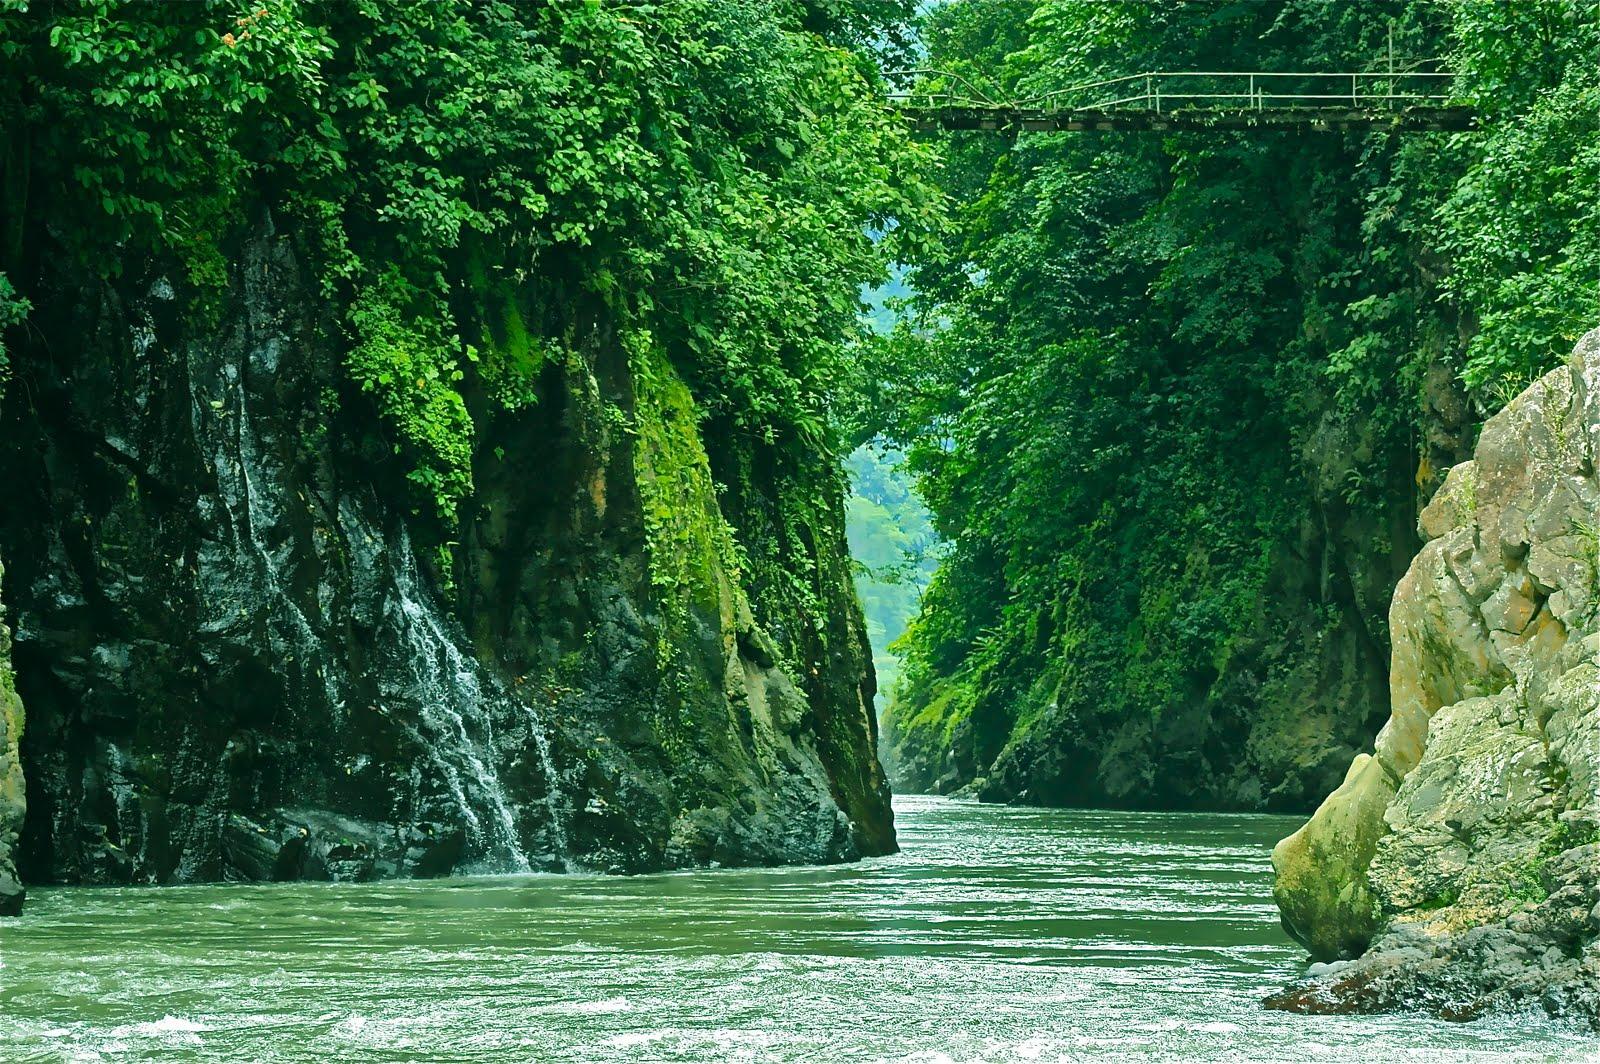 stevie u2019s world class river running resume grows